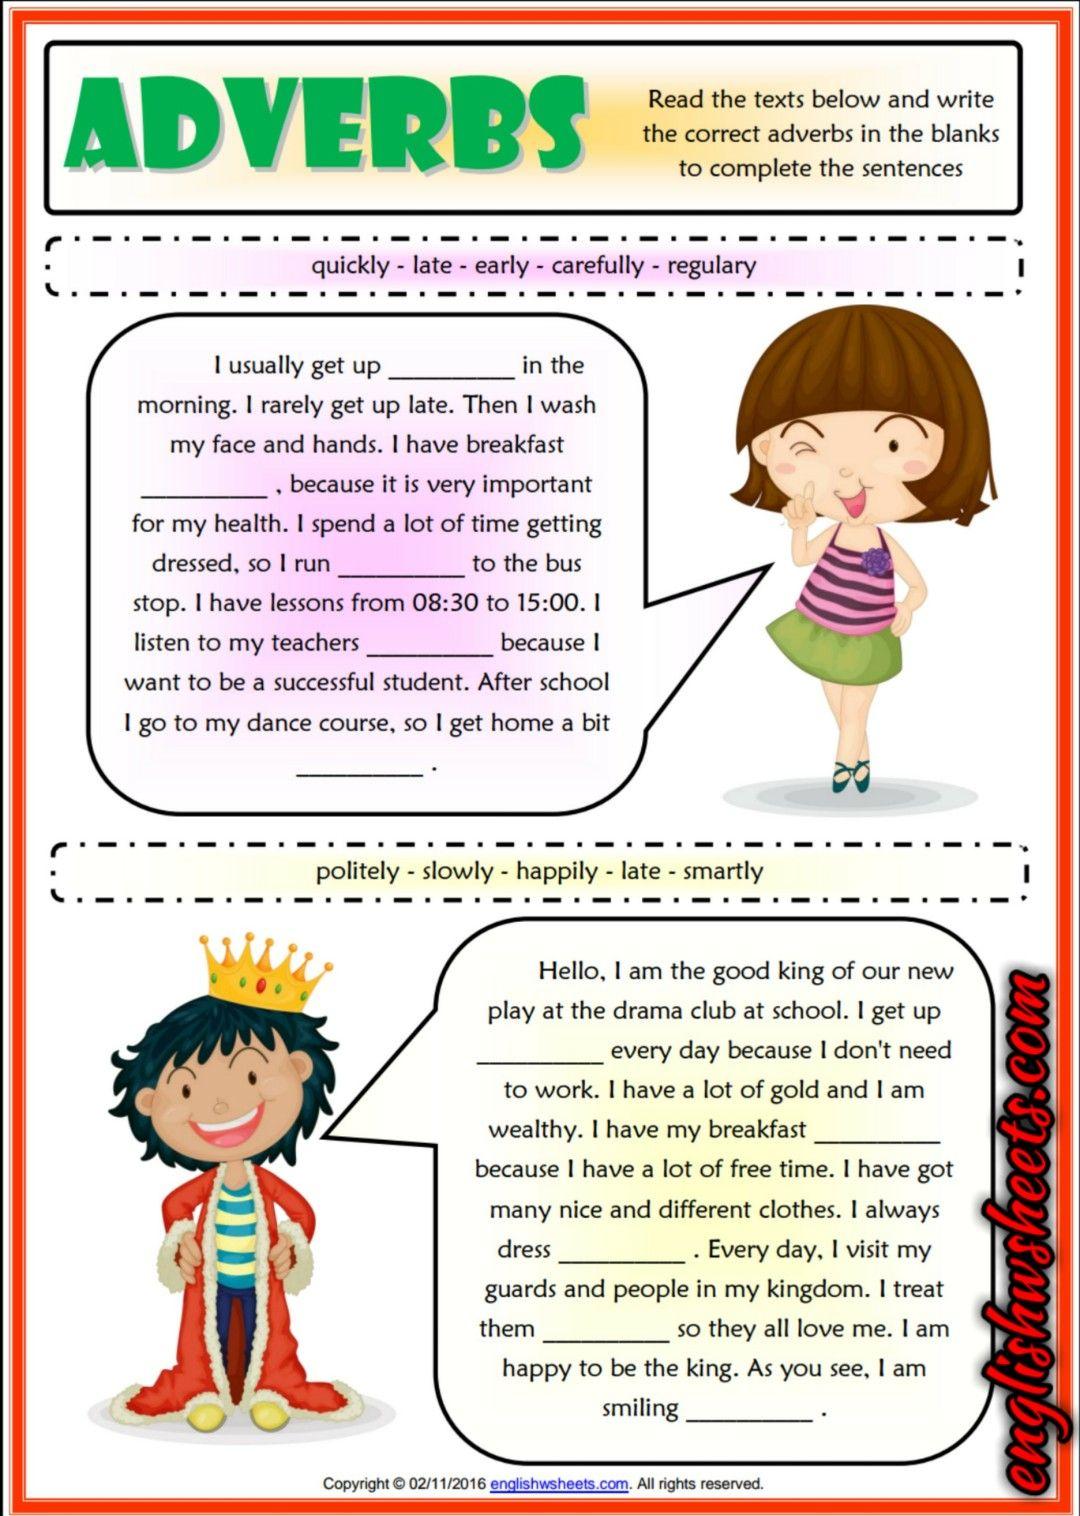 Uncategorized Kids Love Tester adverbs gap fill esl grammar exercises test for kids kids